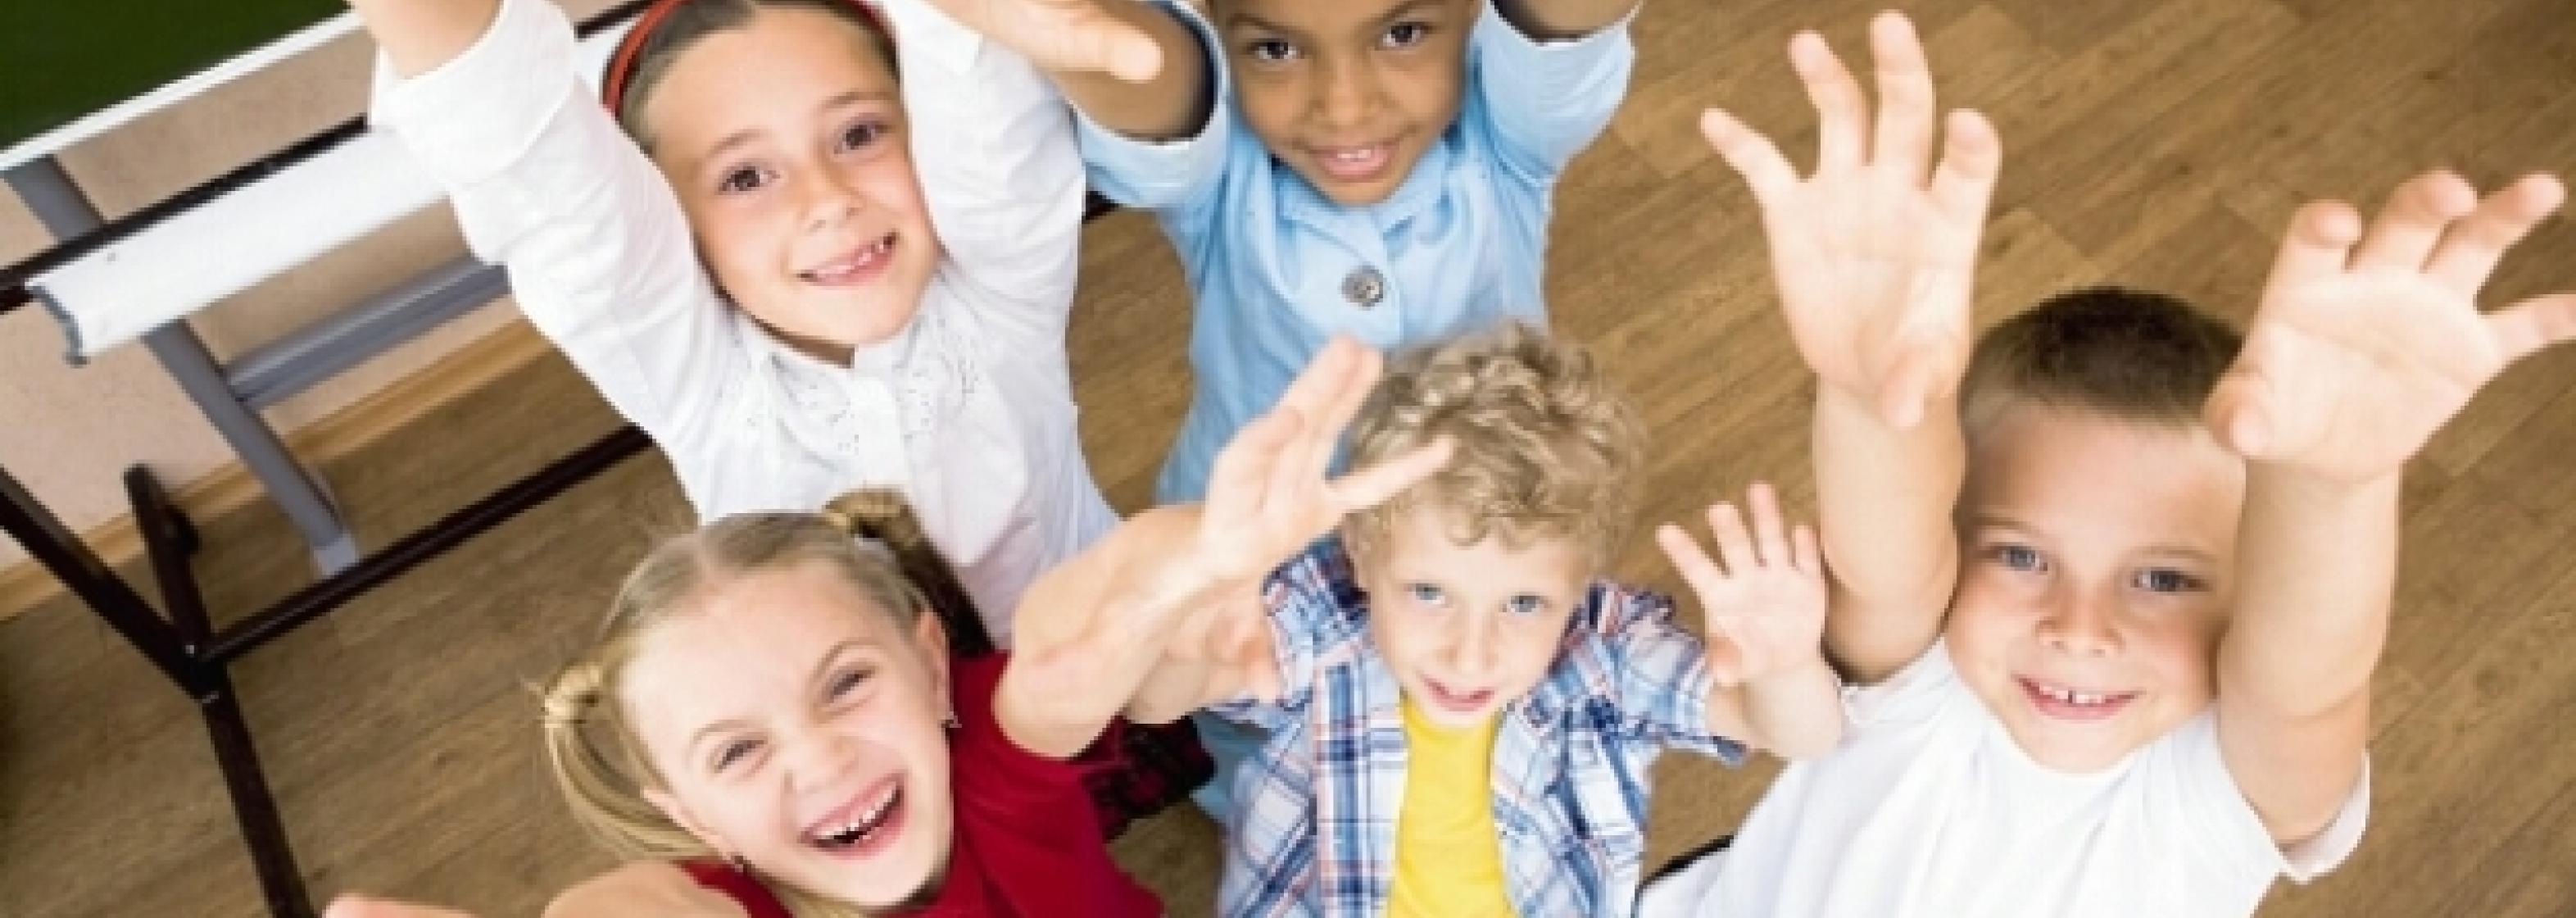 Kinder jubeln